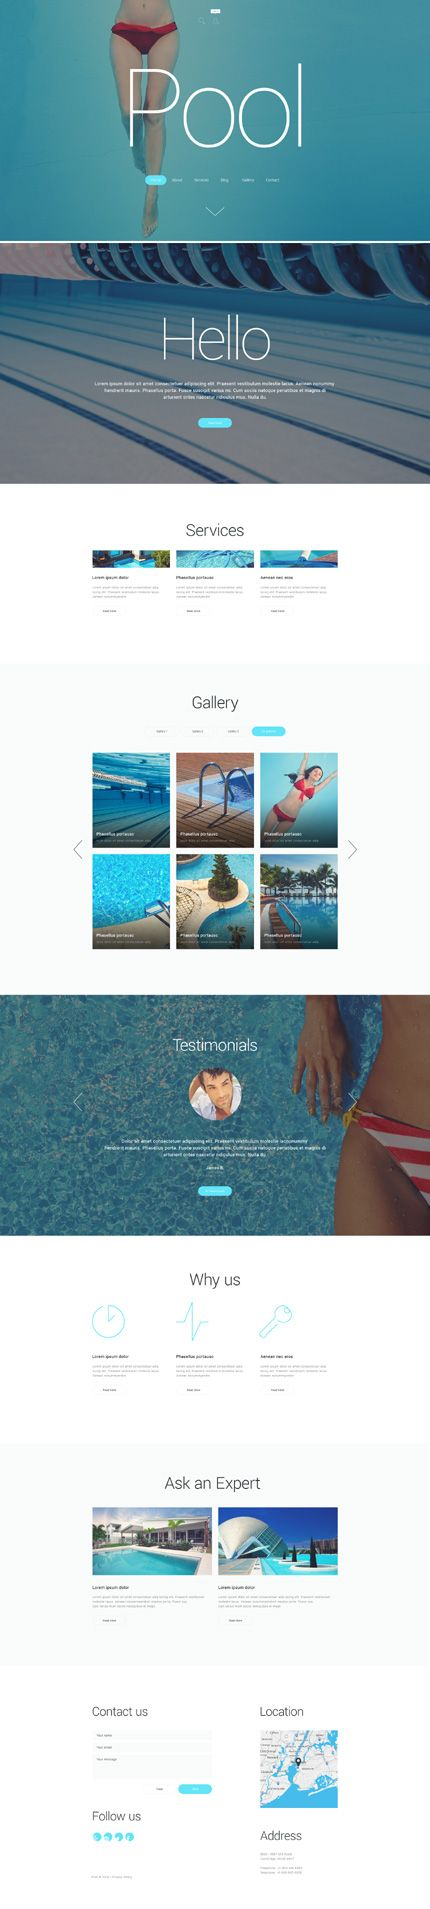 best ppt 参考 images on pinterest package design packaging